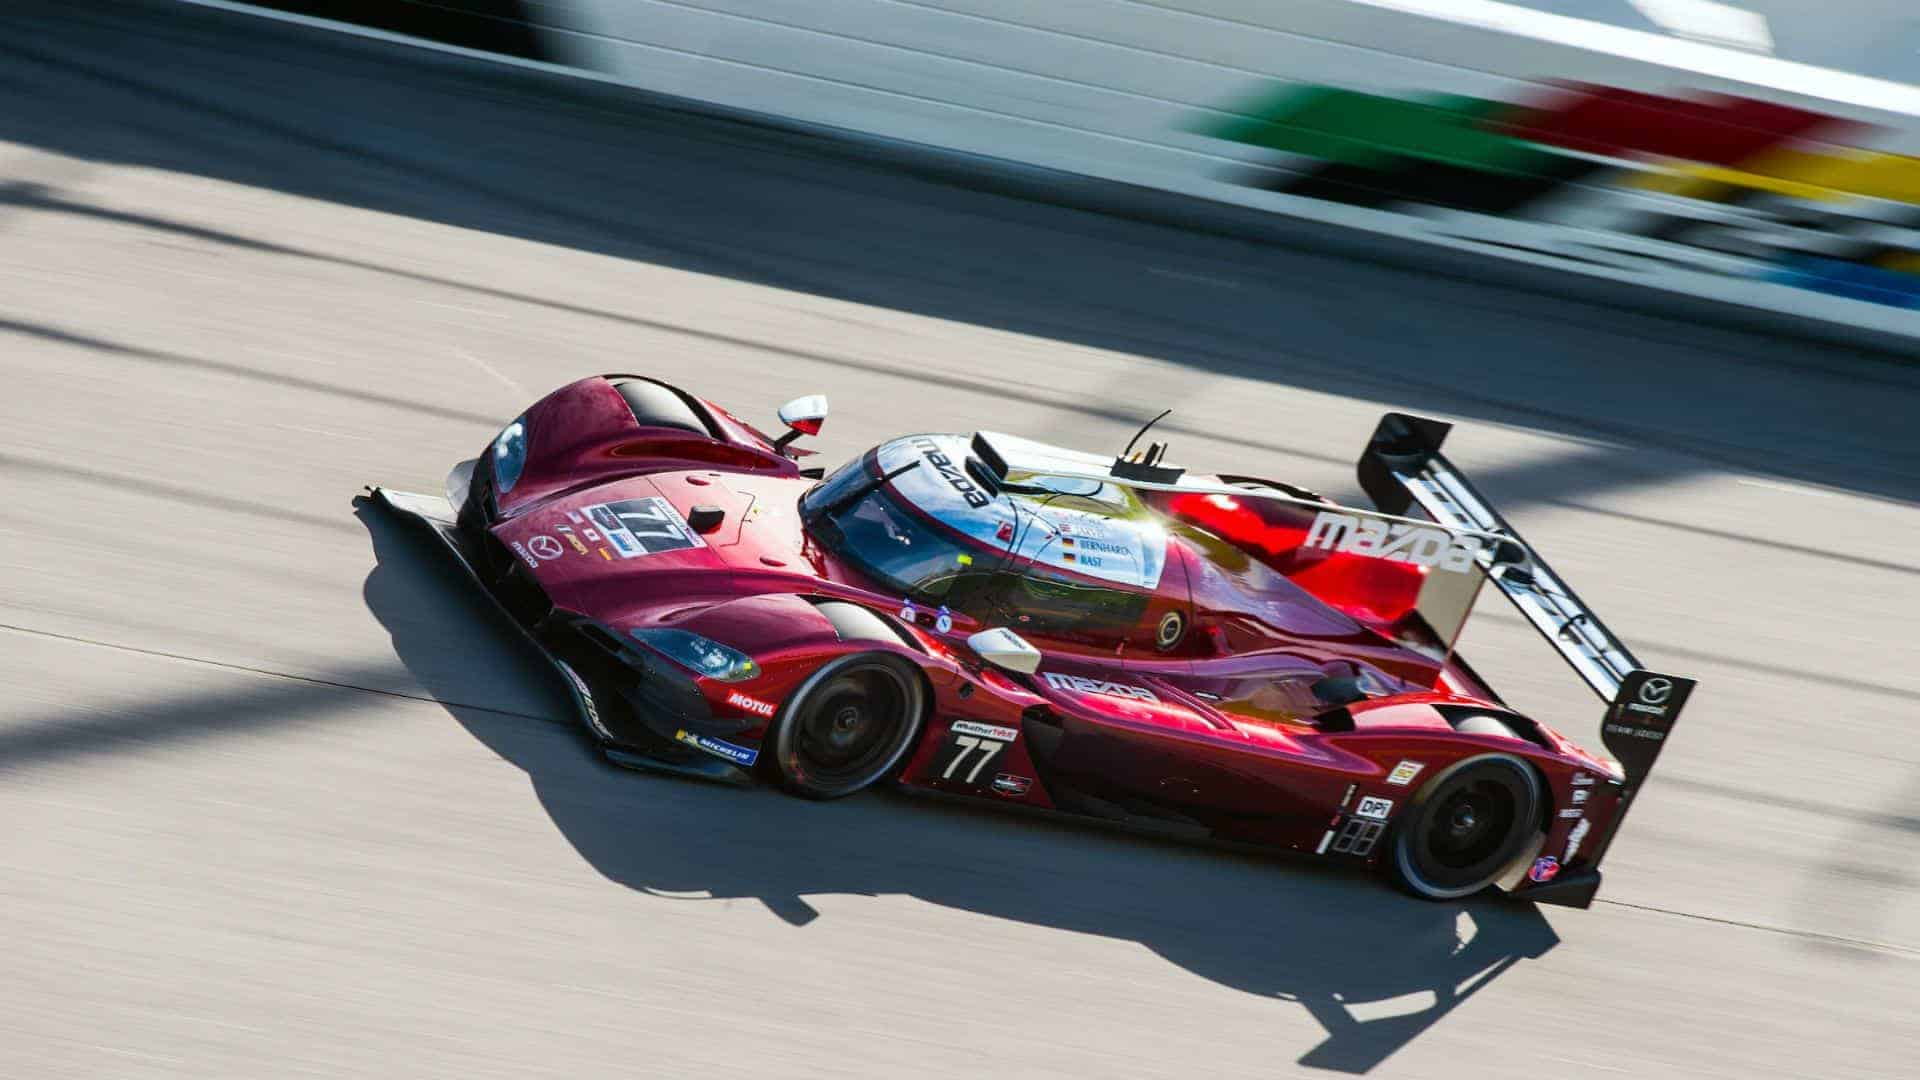 Daytona 24h: Mazda sets new record, Montoya third, Alonso sixth